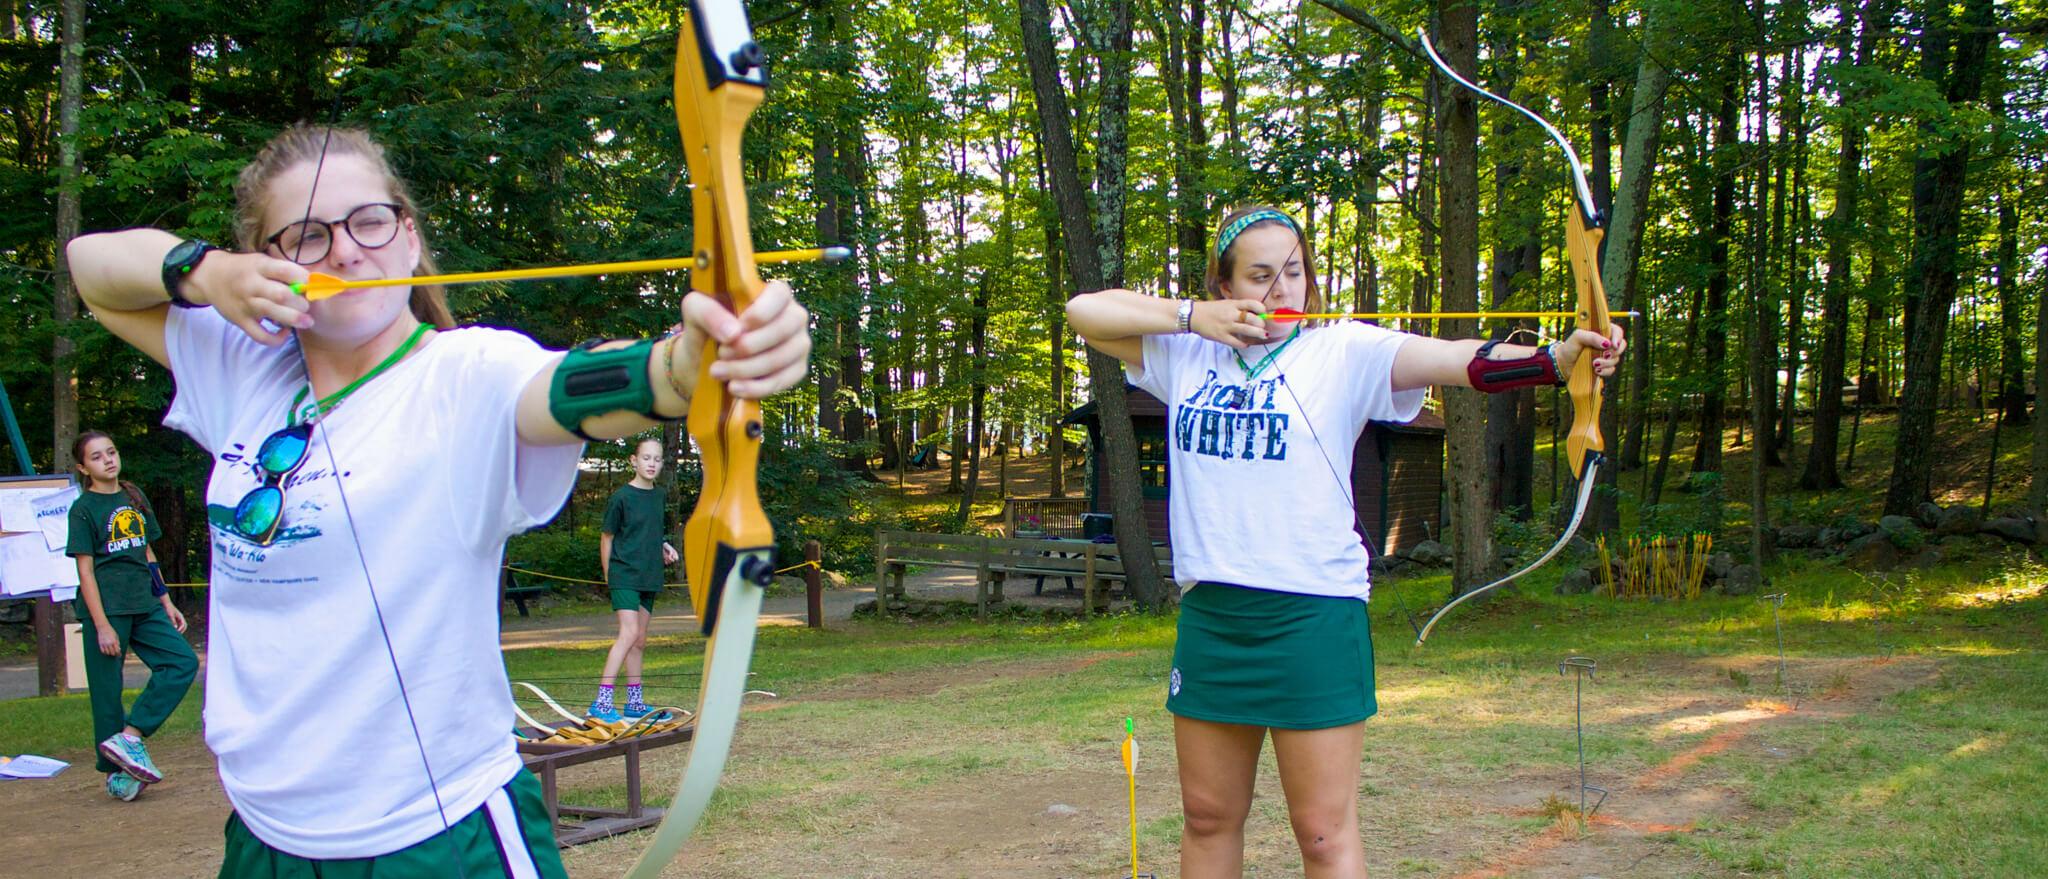 archery jobs at summer camp